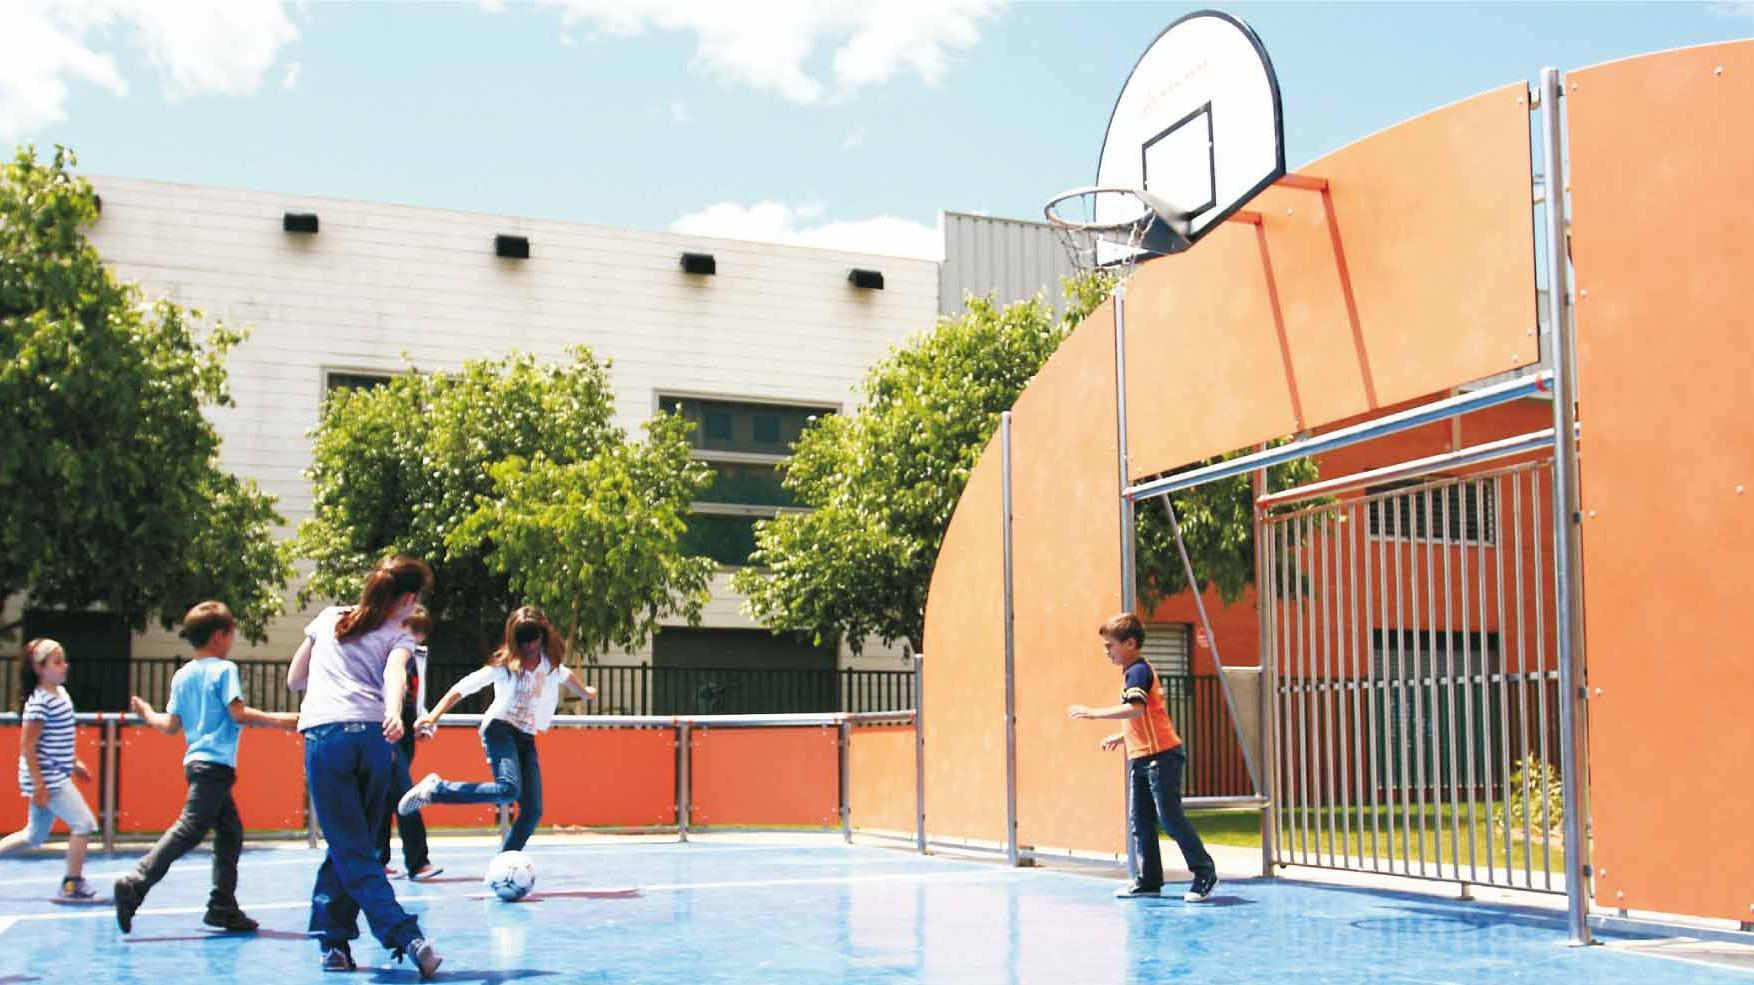 Zonas de pistas deportivas en Rivas Futura